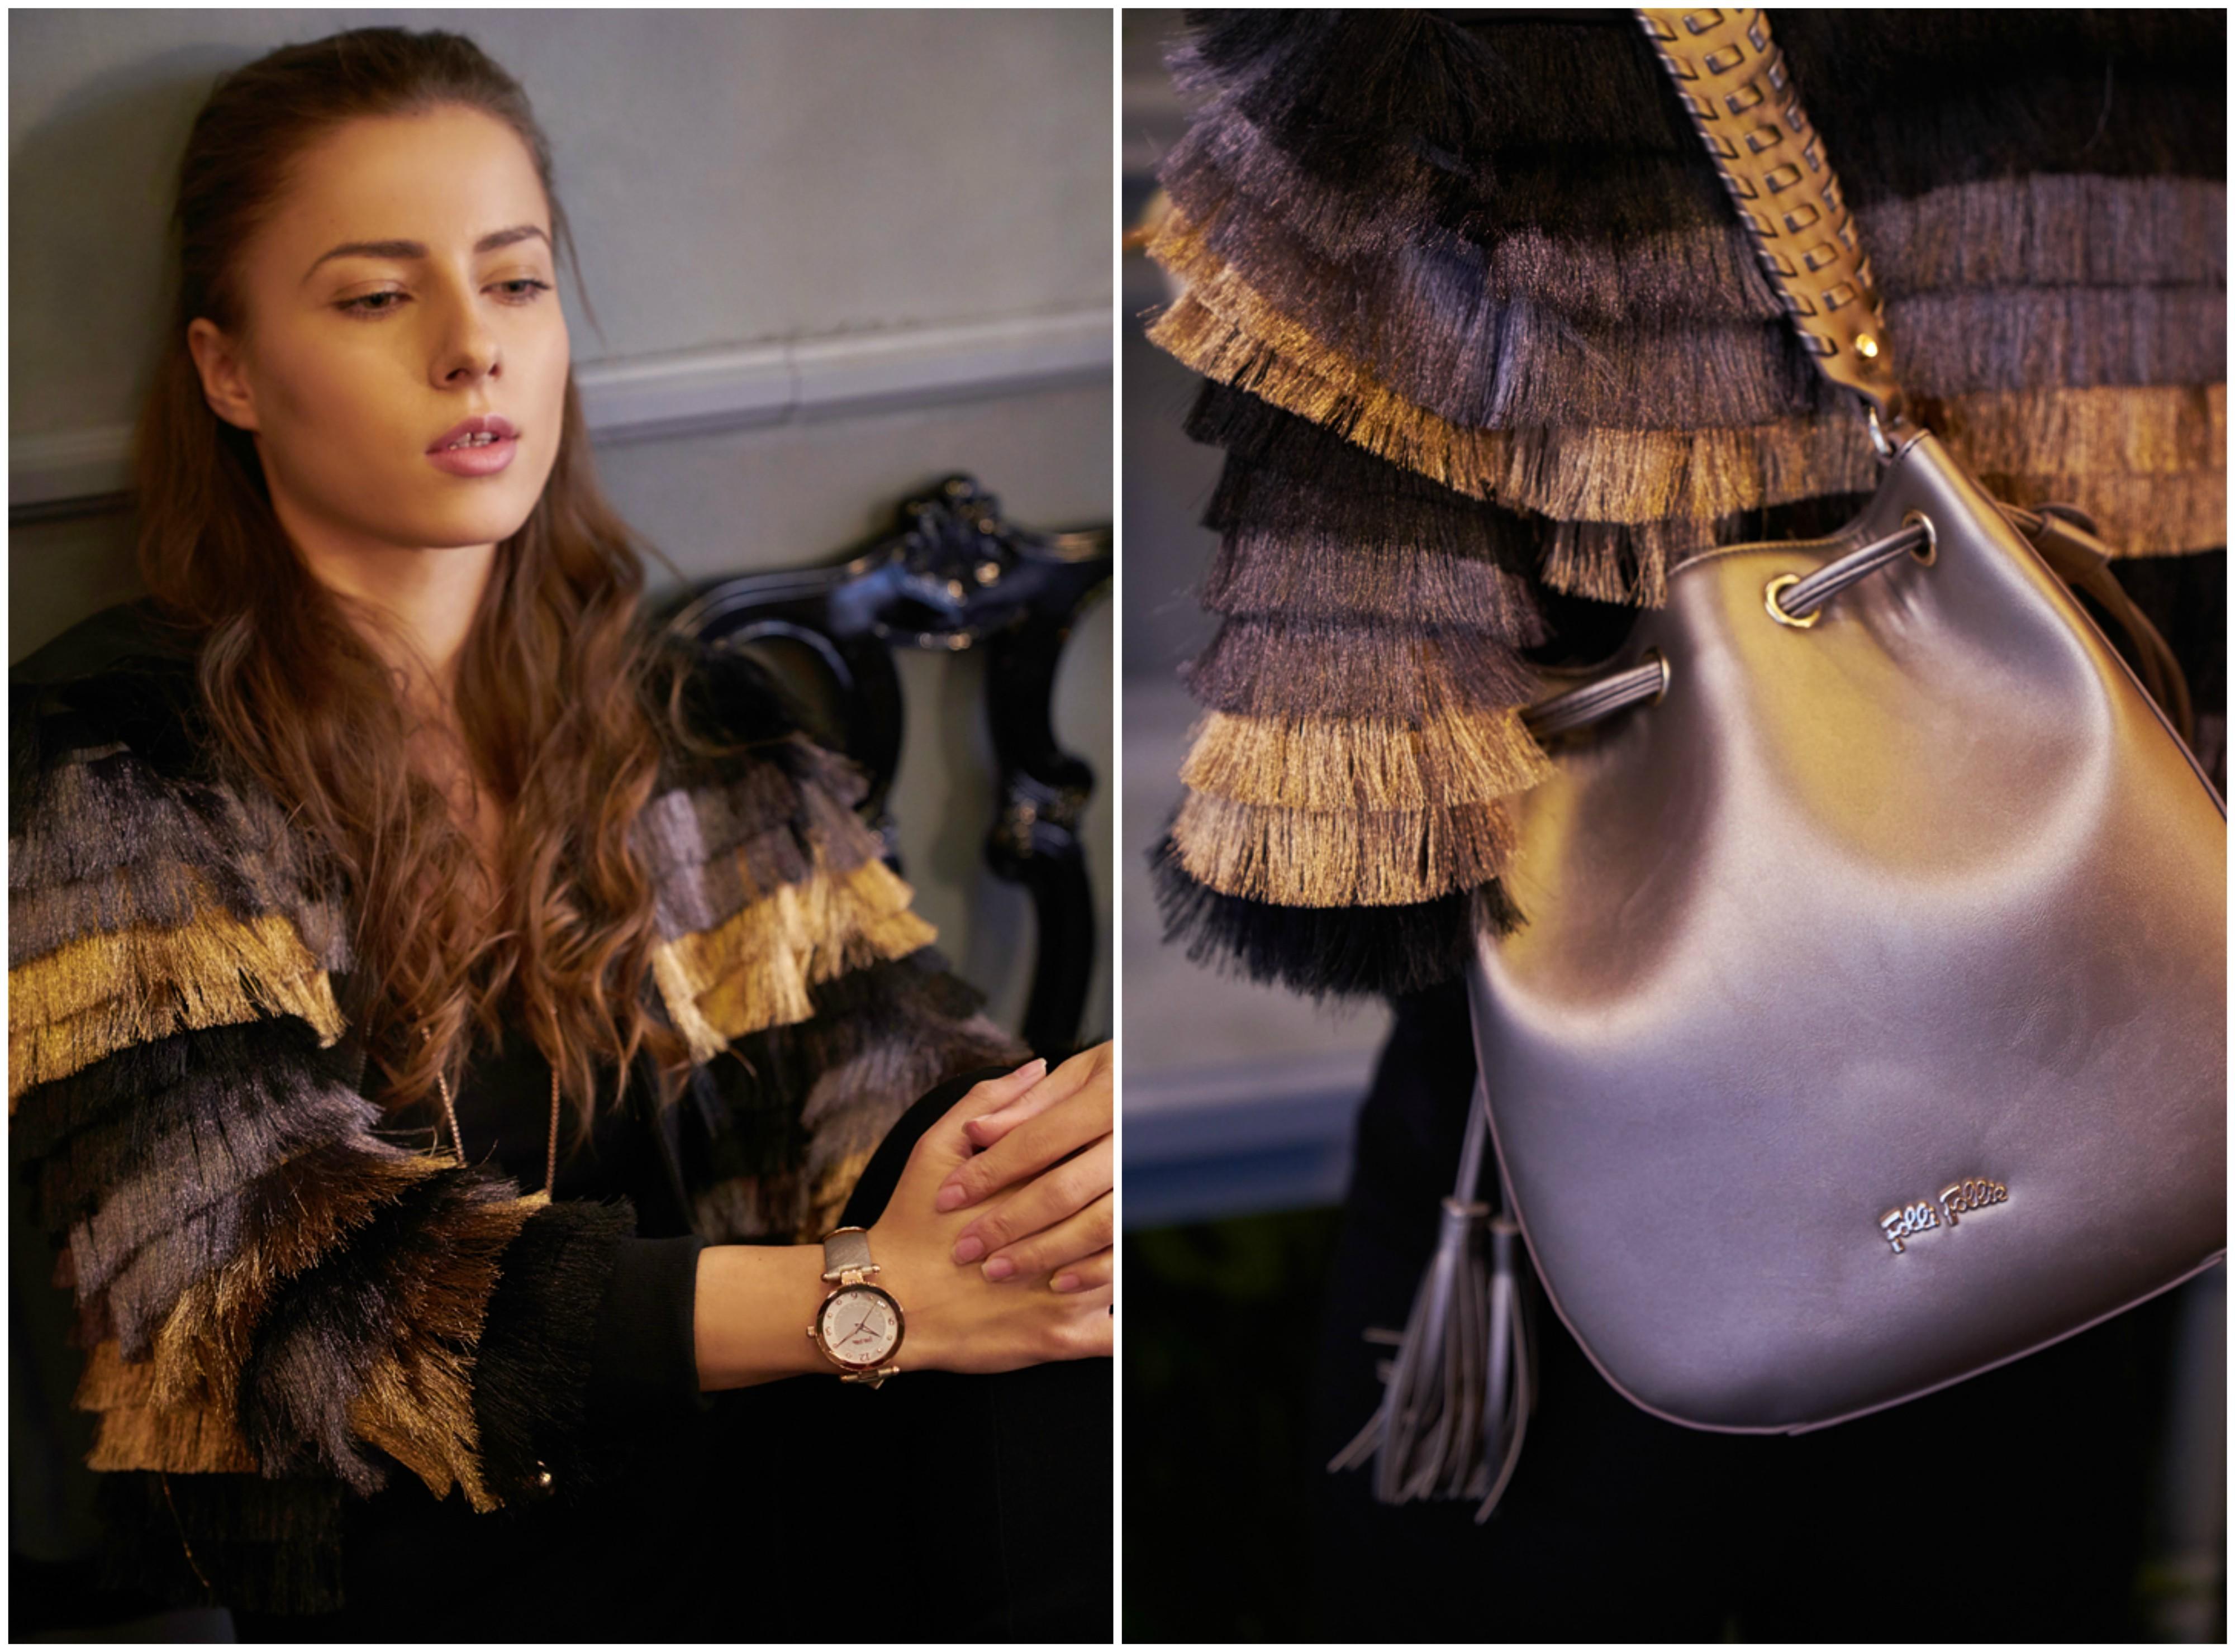 06_folli-follie_zvezdelina-tsolova_mint-stories_fashion-blogger